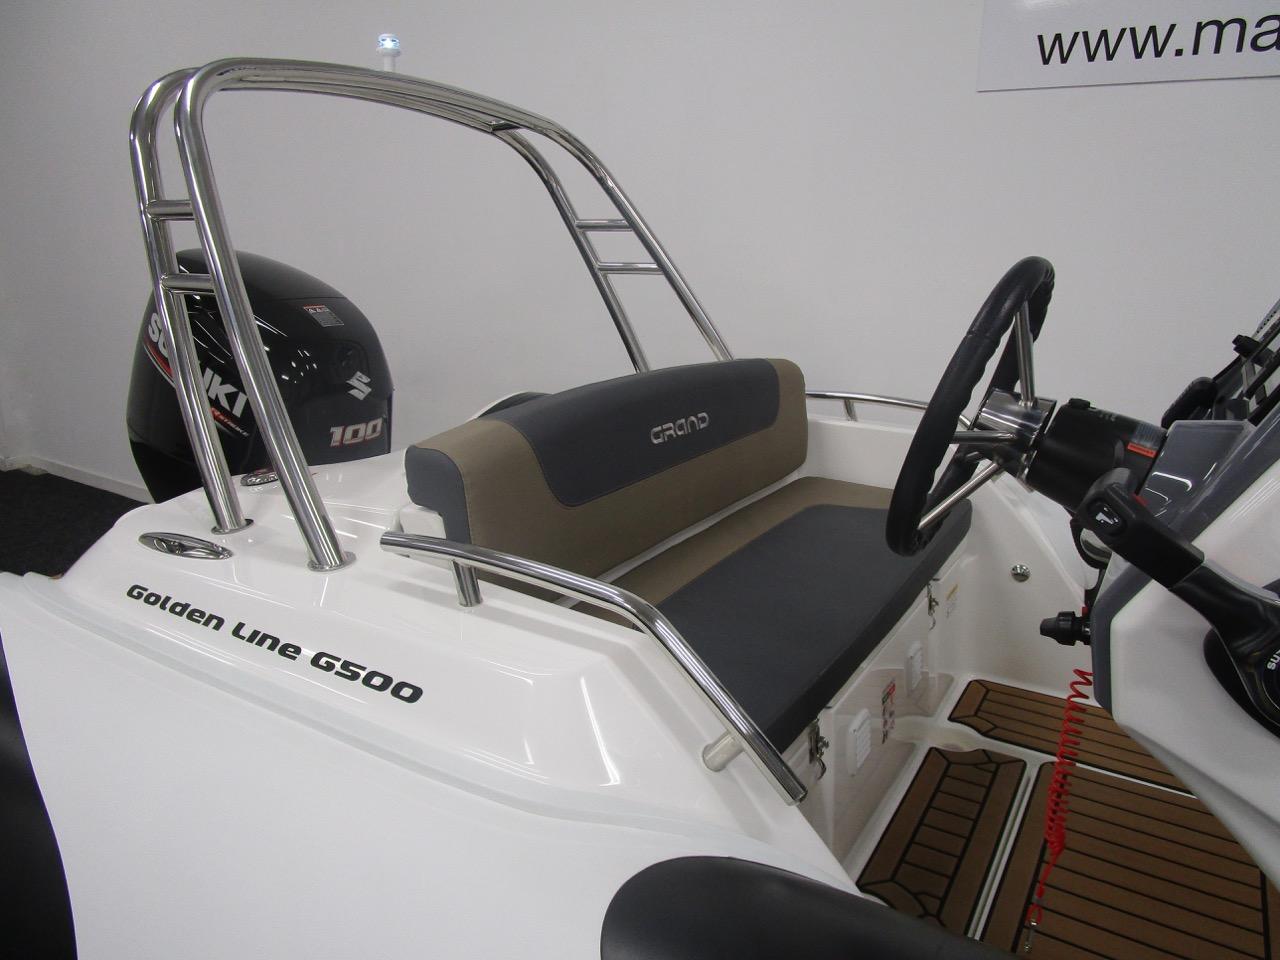 GRAND G500 RIB ski arch and rear seat